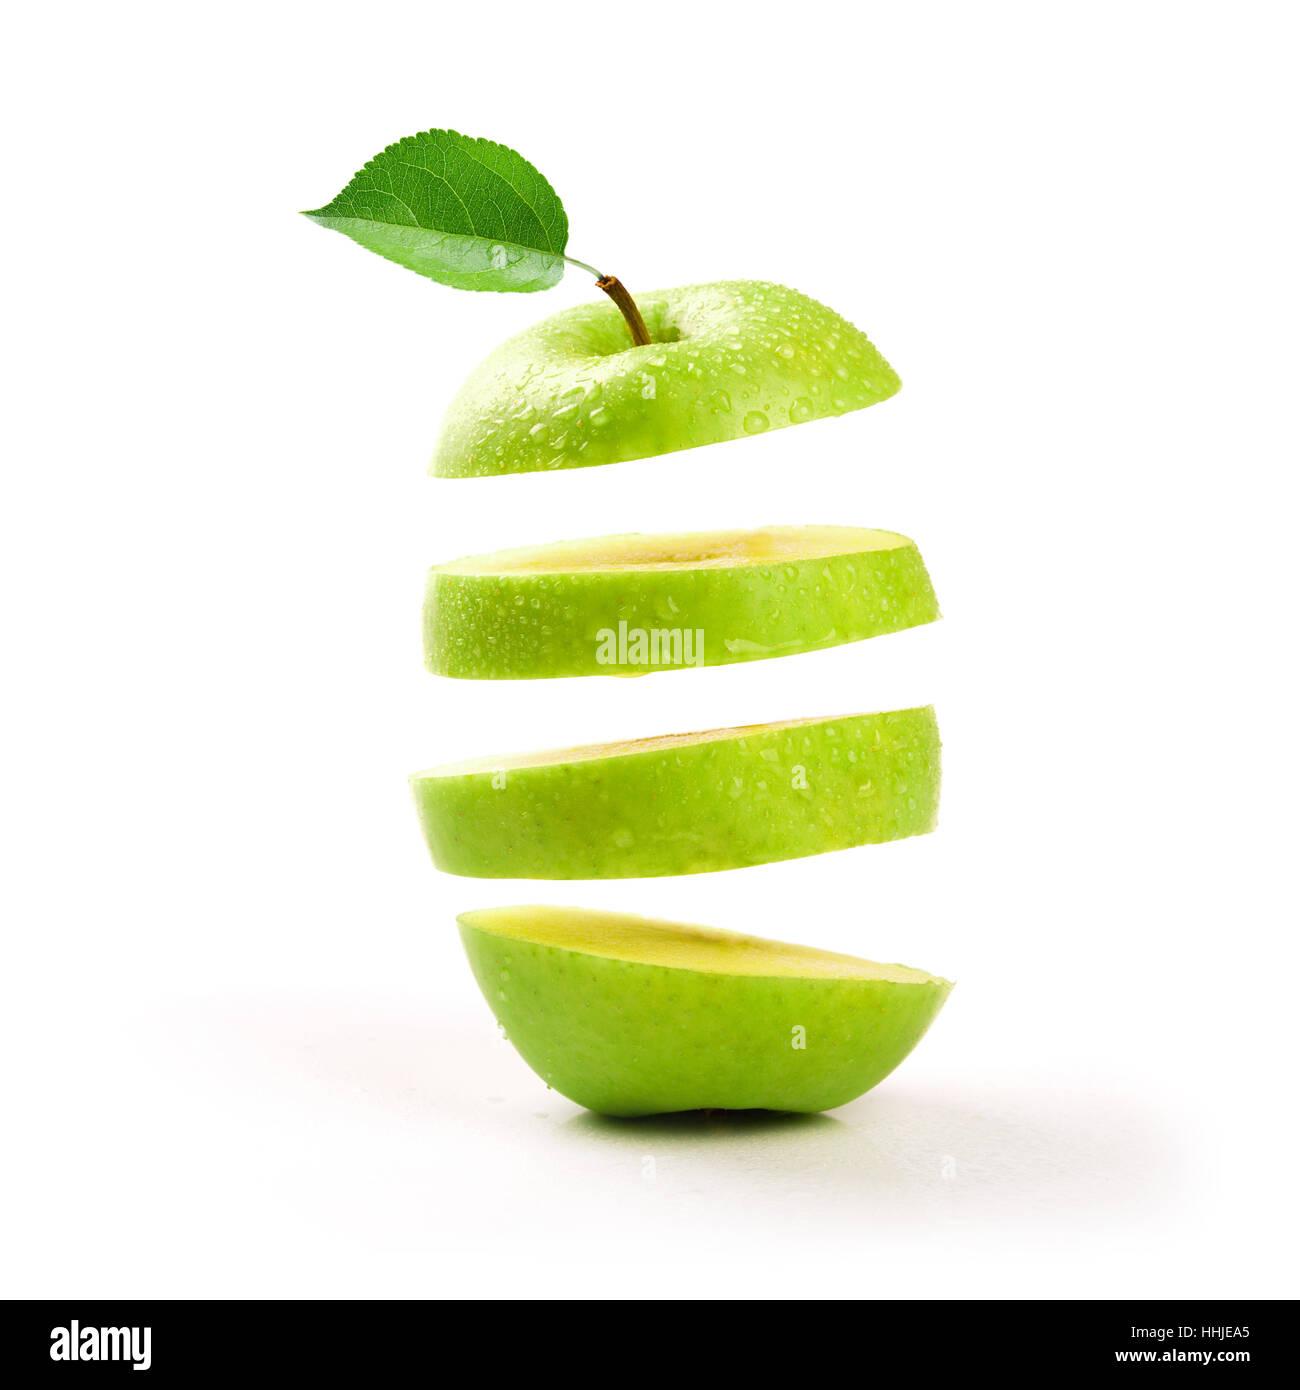 sliced green apple levitating on white background - Stock Image